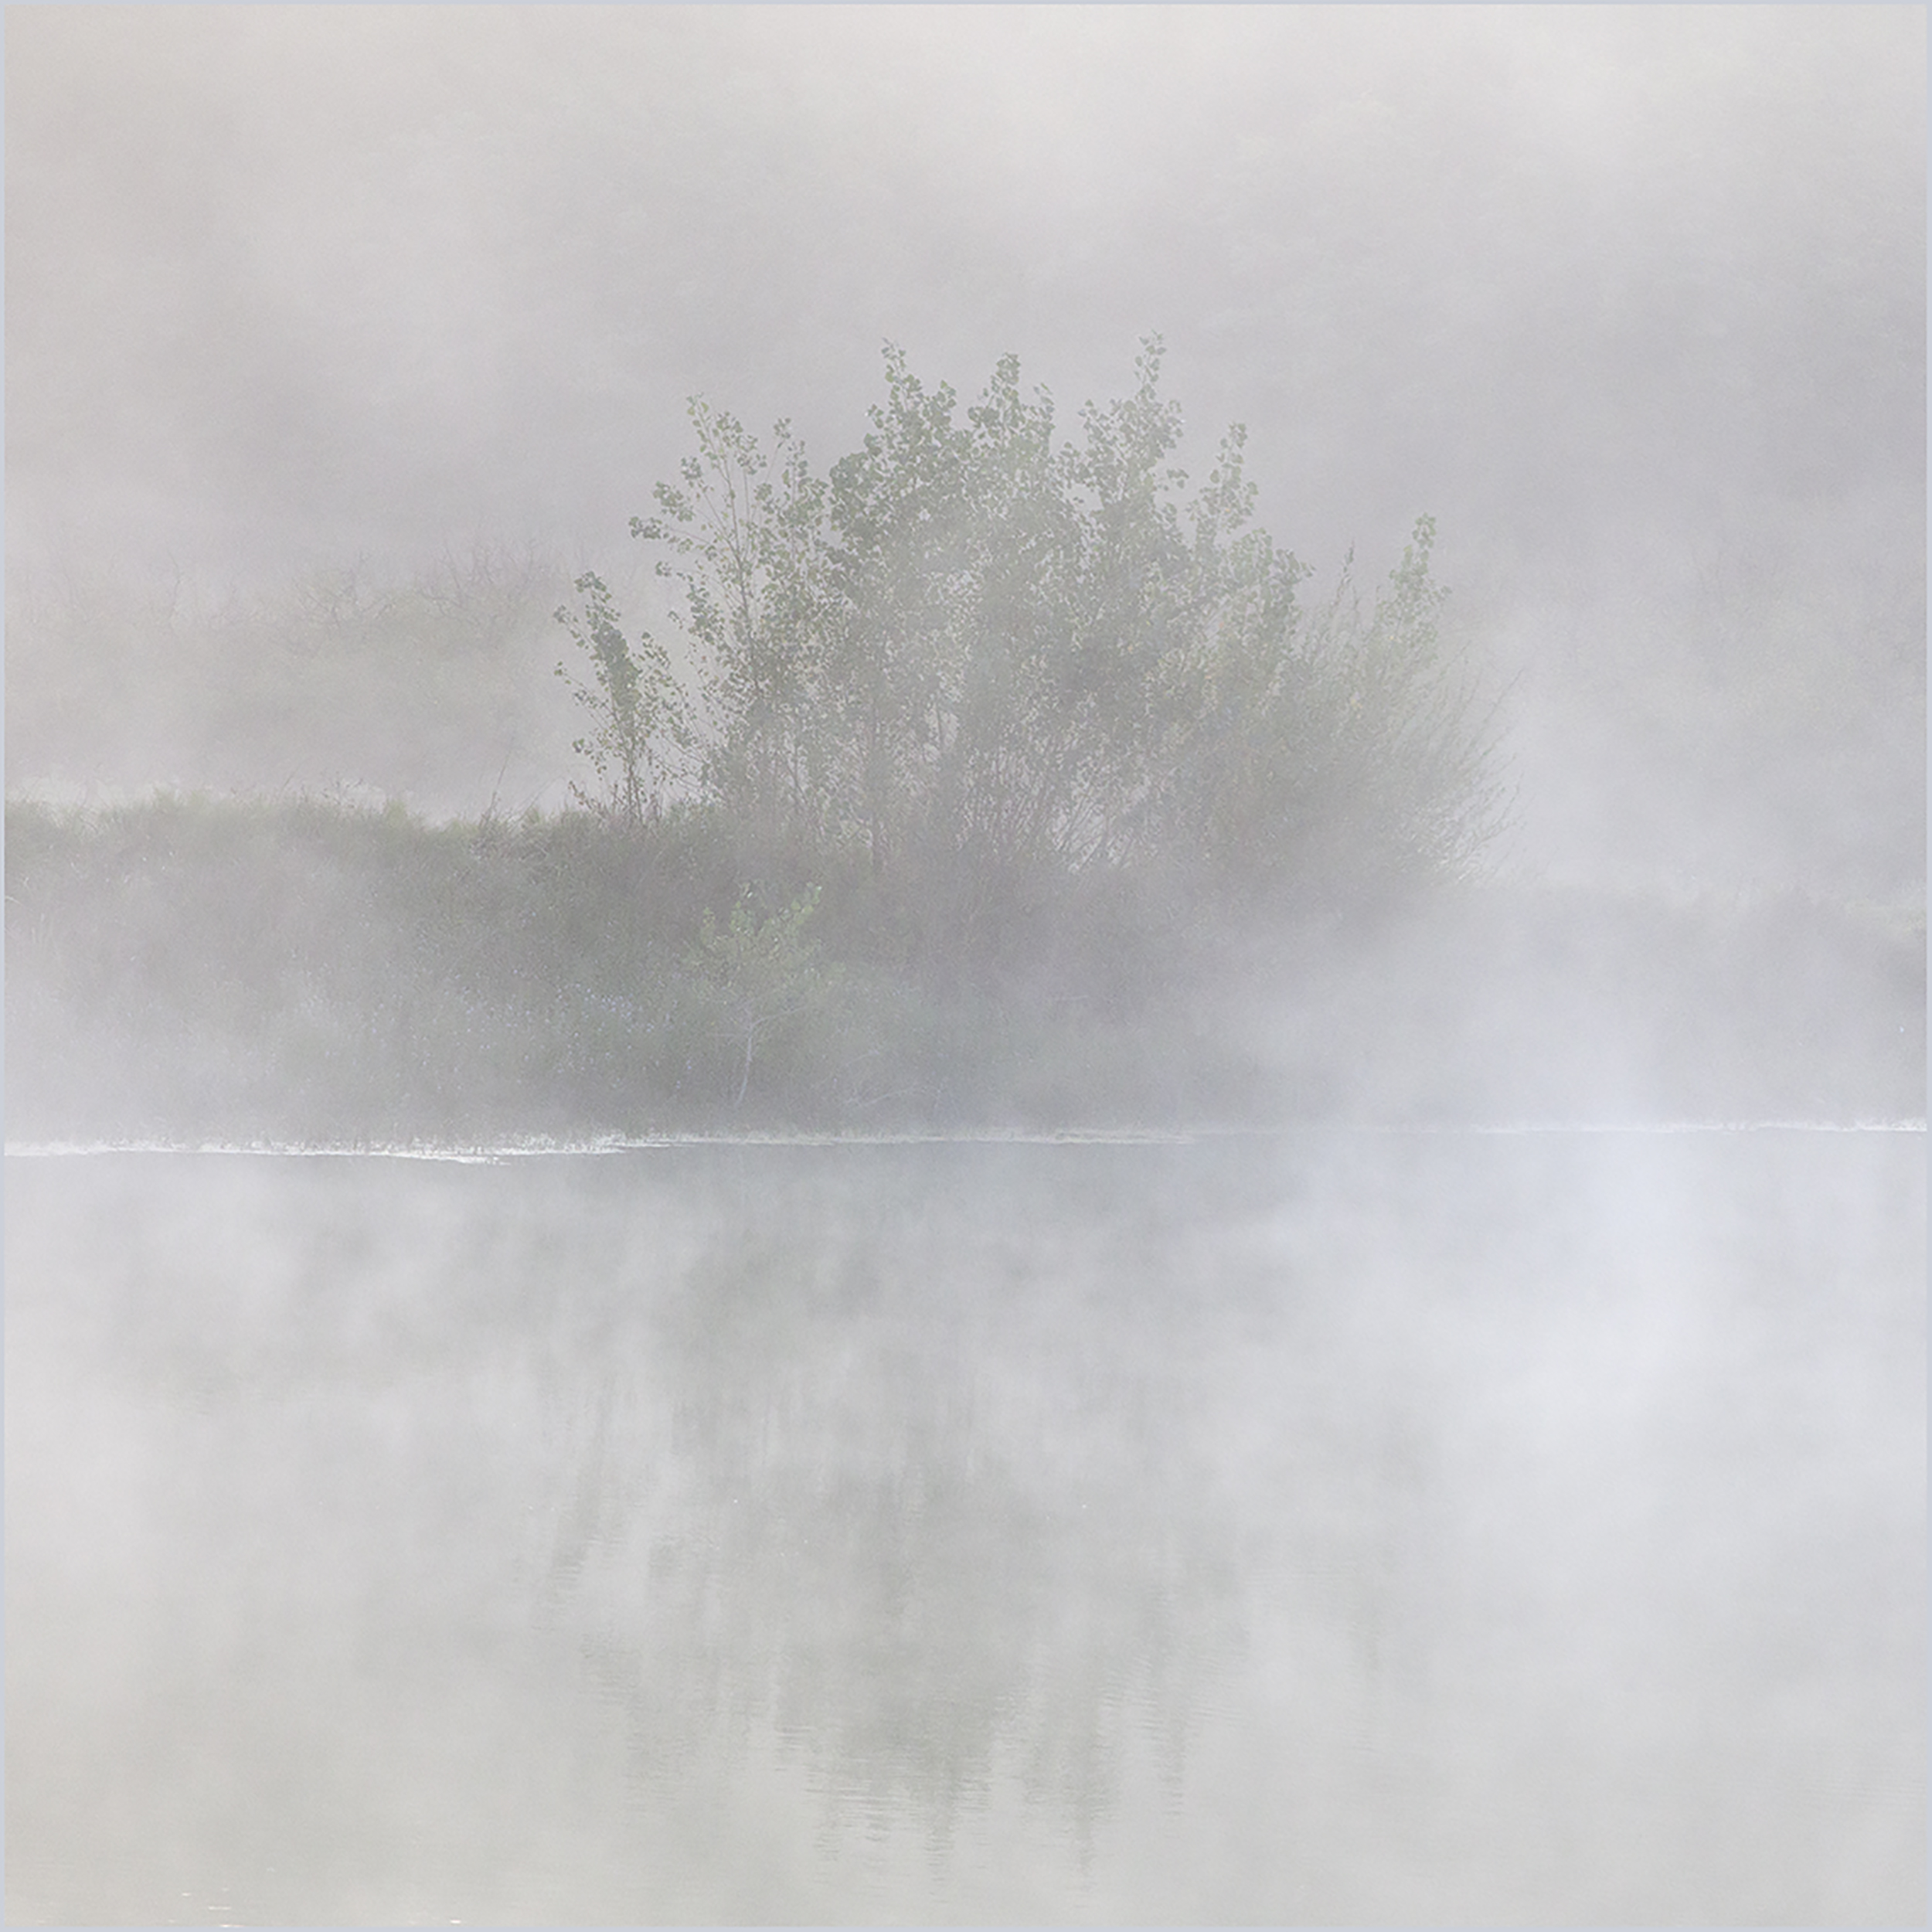 Early morning Mist 2.jpg